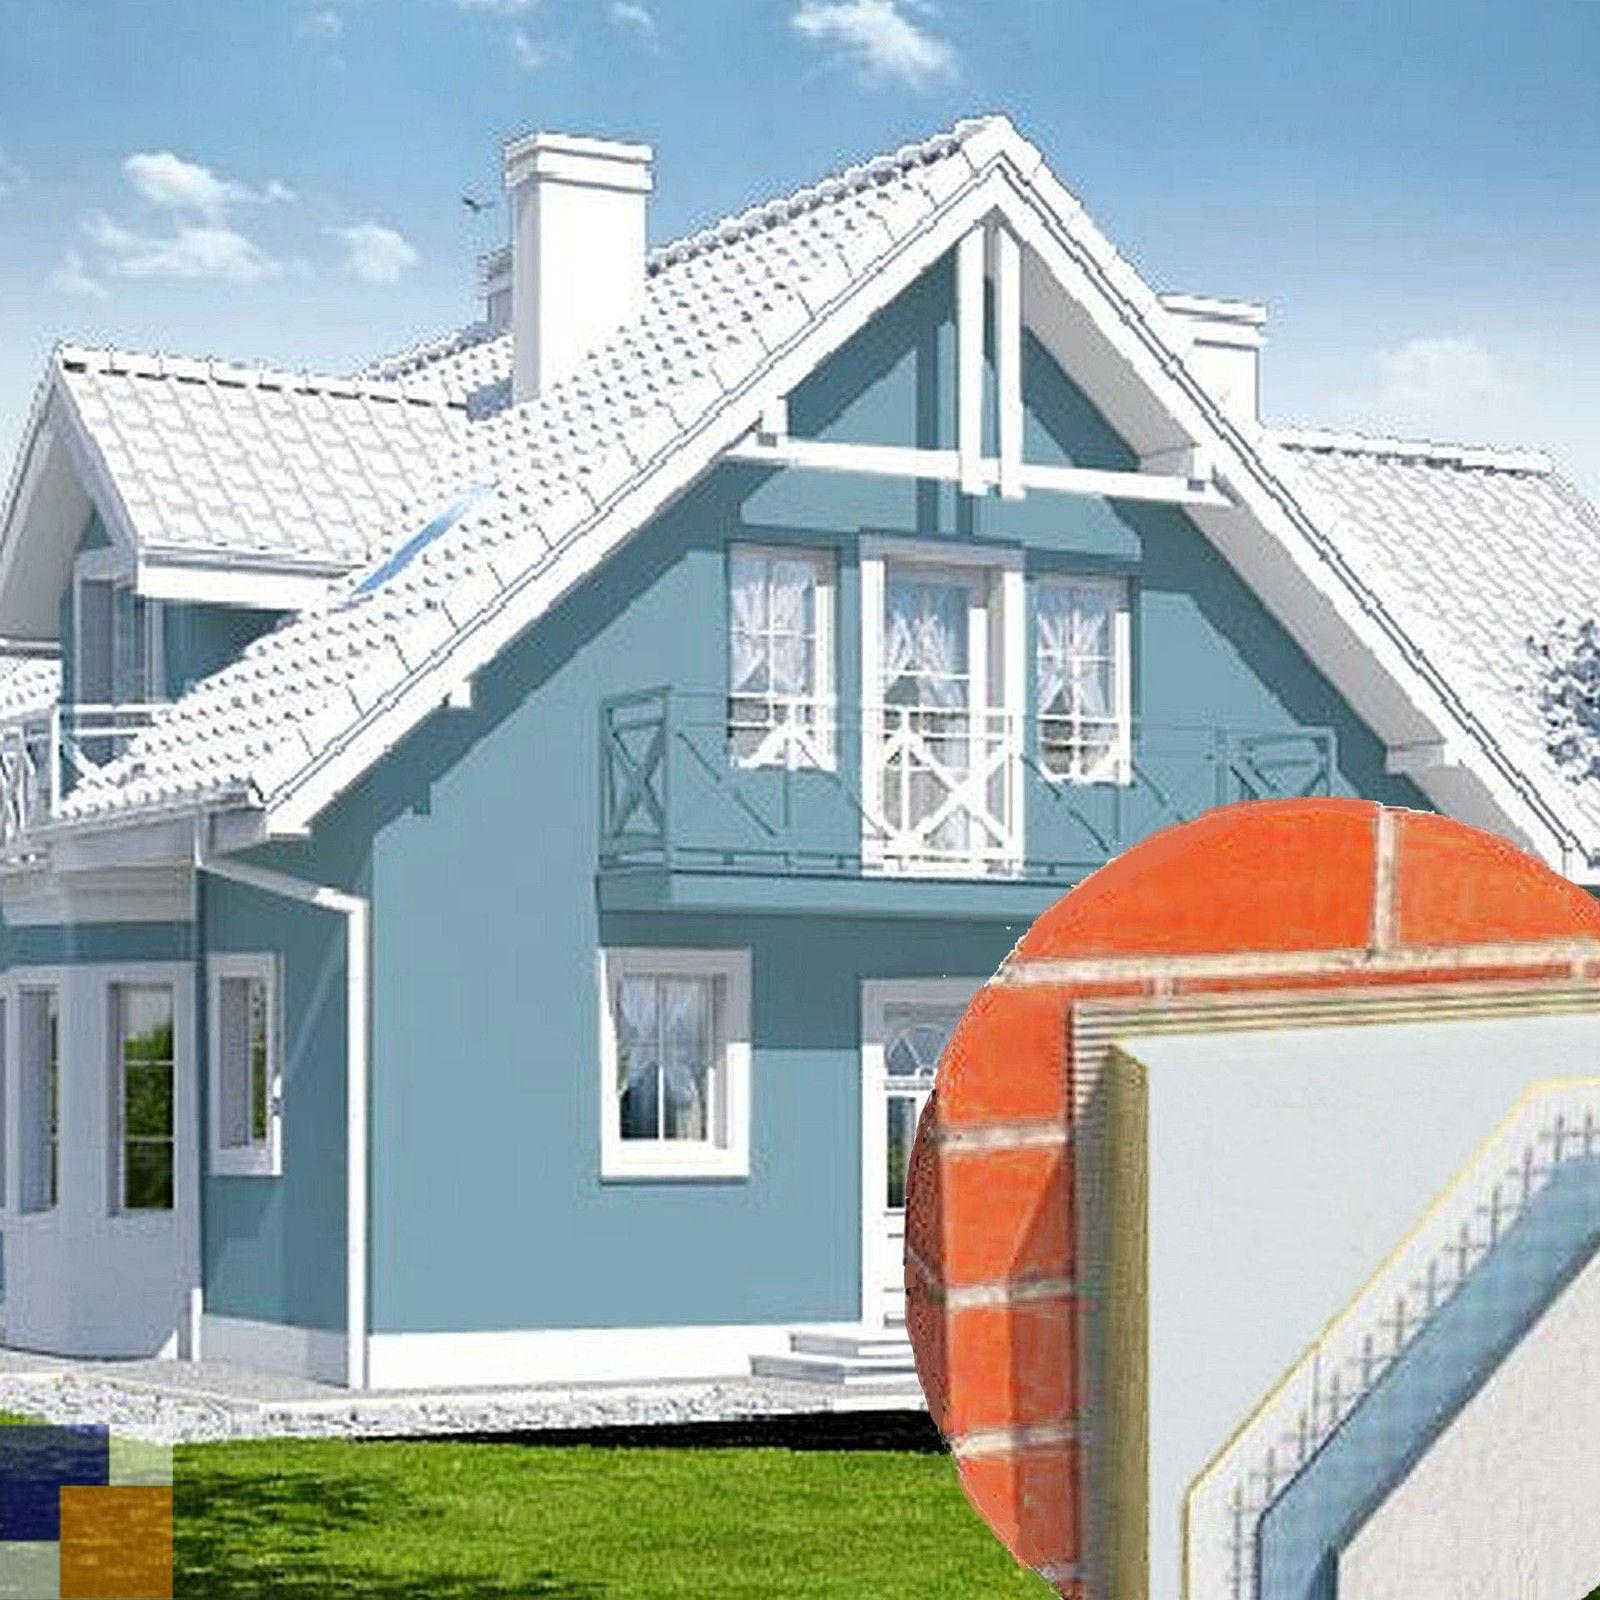 150 qm 80 mm KOMPLETTPAKET Fassadendämmung WDVS Dämmung